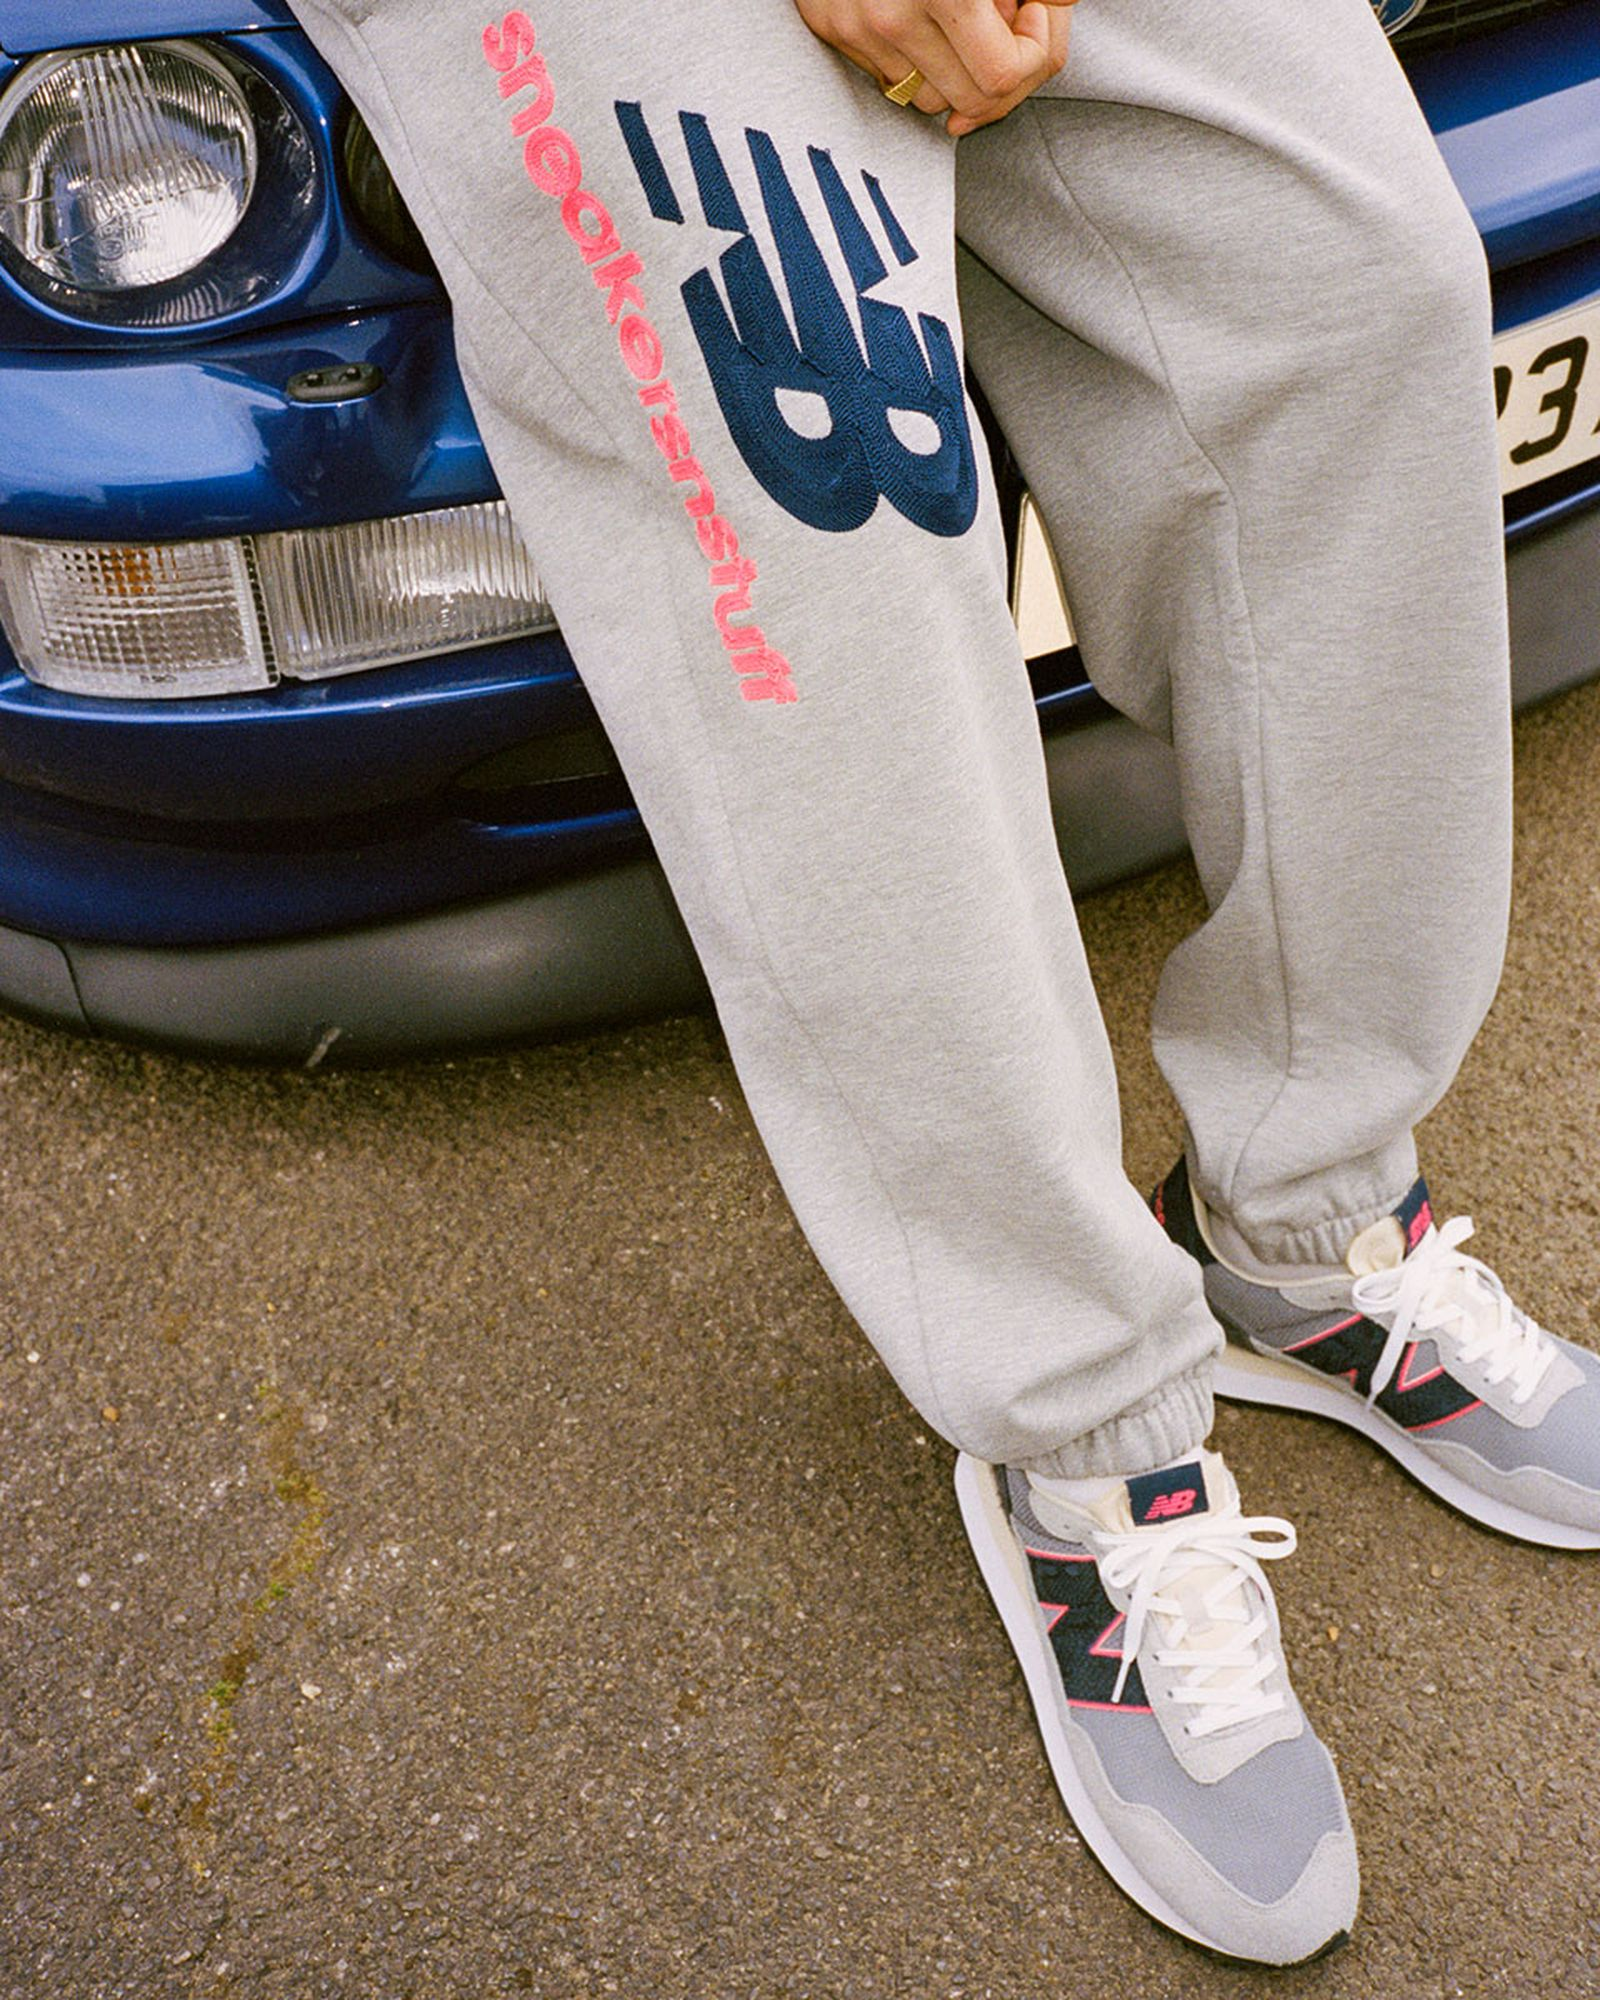 sneakersnstuff-new-balance-237-release-date-price-02